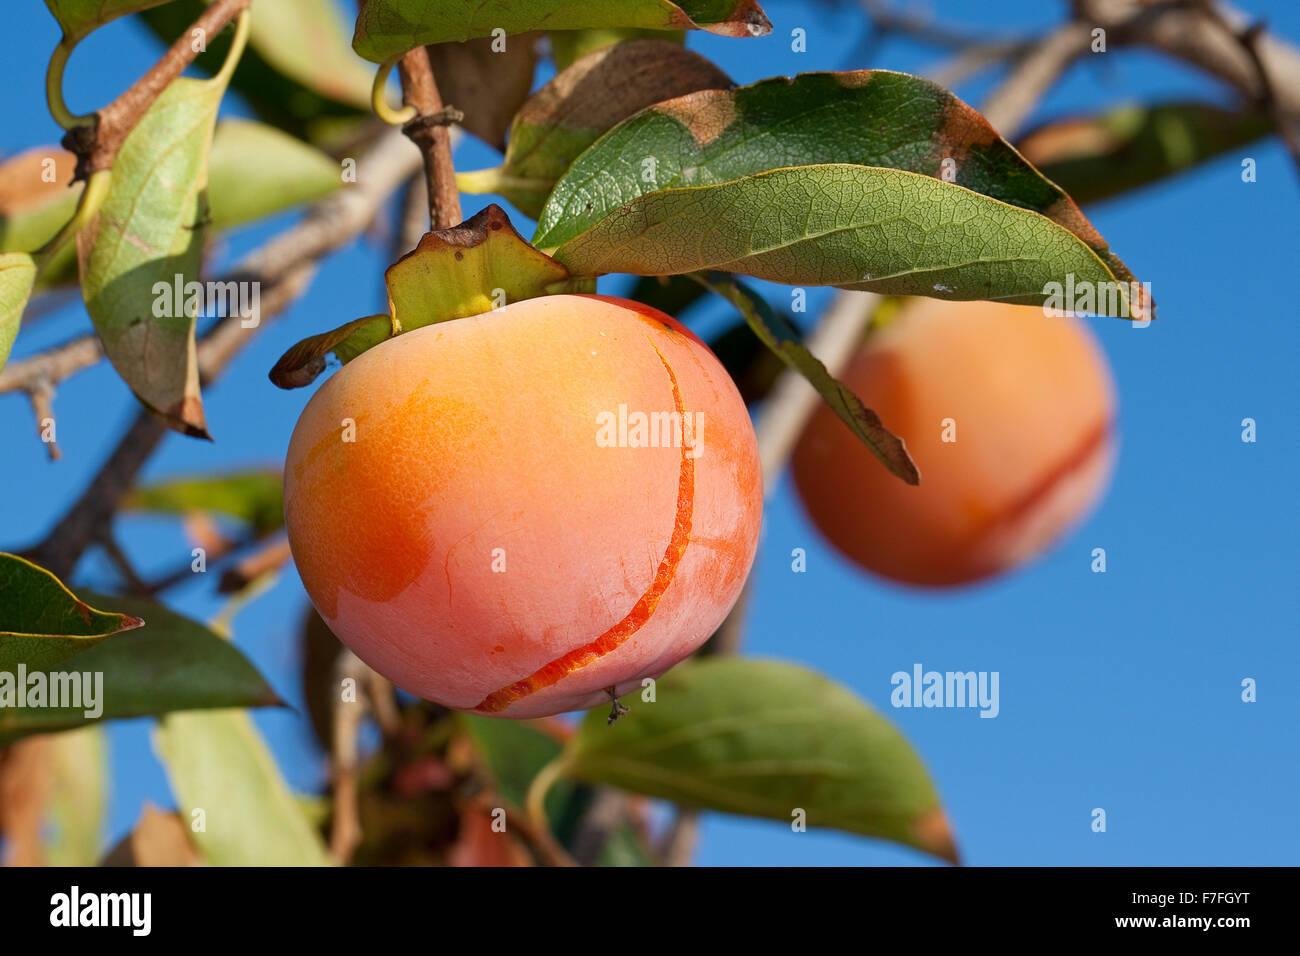 Japanese Persimmon, Kaki Persimmon, Asian Persimmon, Kakipflaume, Kaki-Pflaume, Kakibaum, JSharon-Frucht, Diospyros - Stock Image